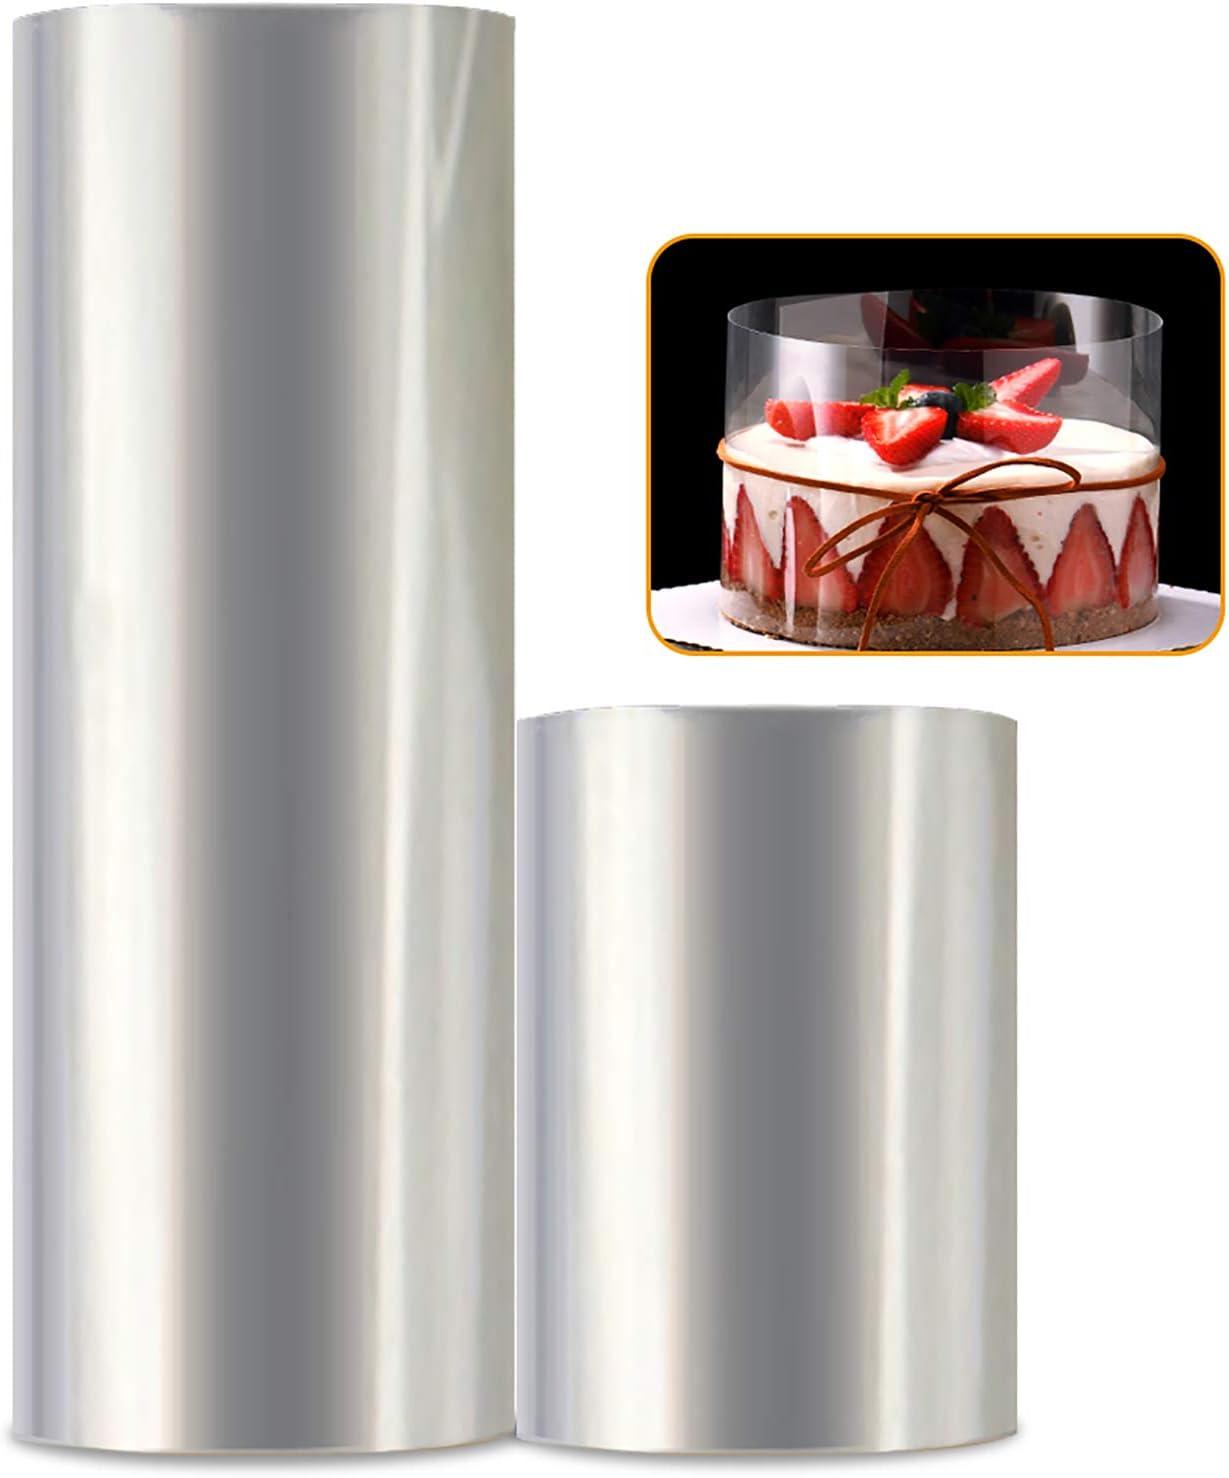 Cake Collar, 2Pack Transparent Mousse Cake Rolls, Cake Collar Baking Surrounding Edge Decorating,Transparent Mousse Cake Acetate Sheets for Chocolate Mousse Baking,Cake Decorating